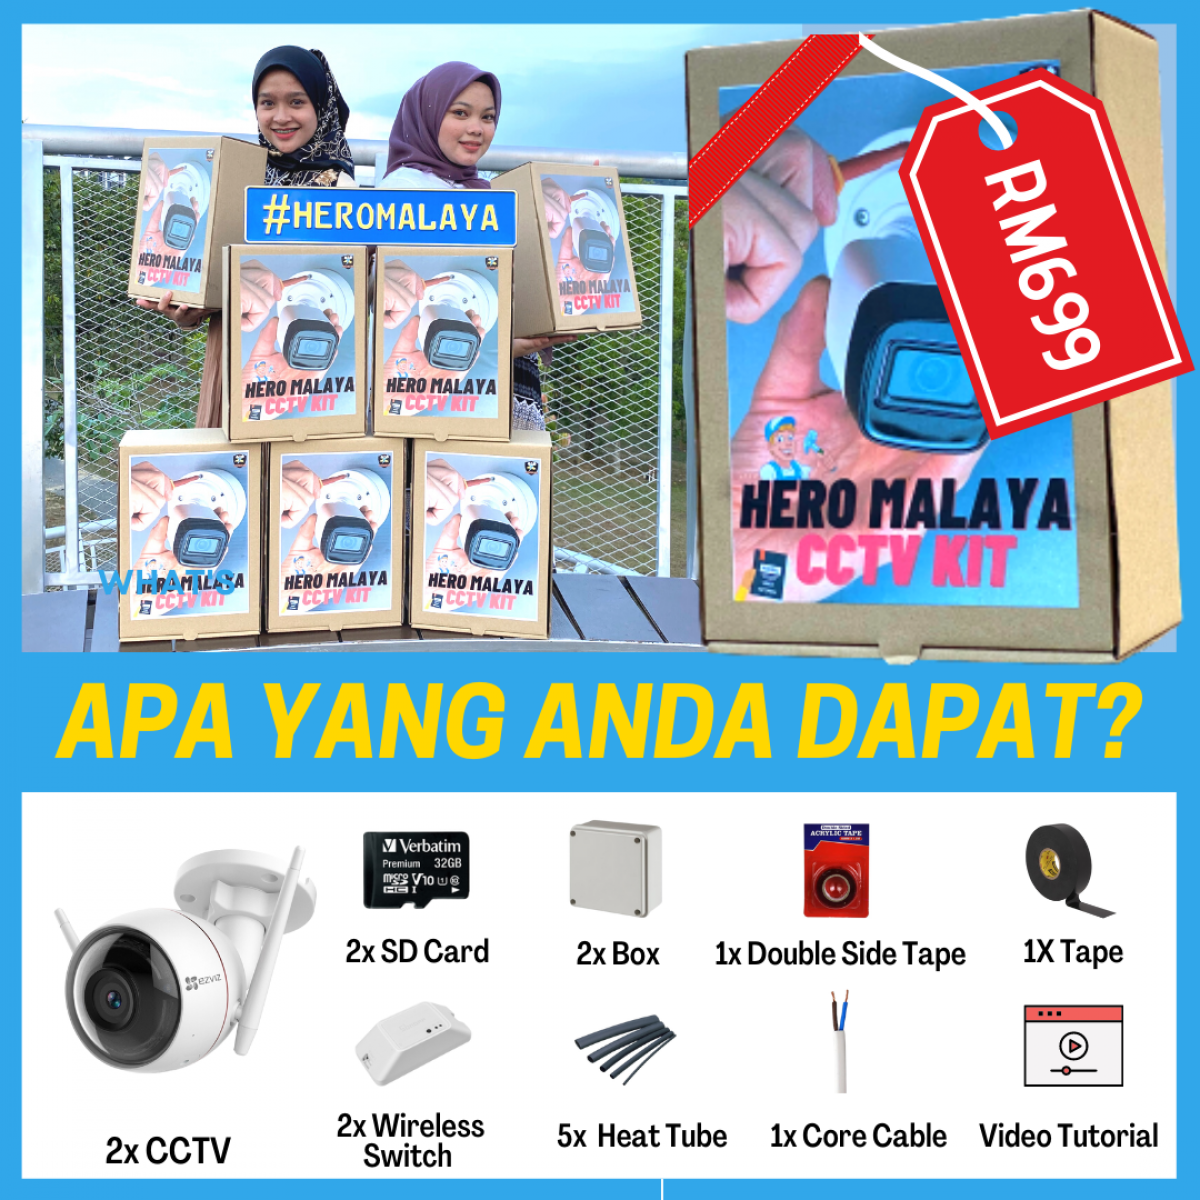 HERO MALAYA CCTV KIT BOX | 2 UNIT OUTDOOR WEATHER PROOF - Wireless CCTV